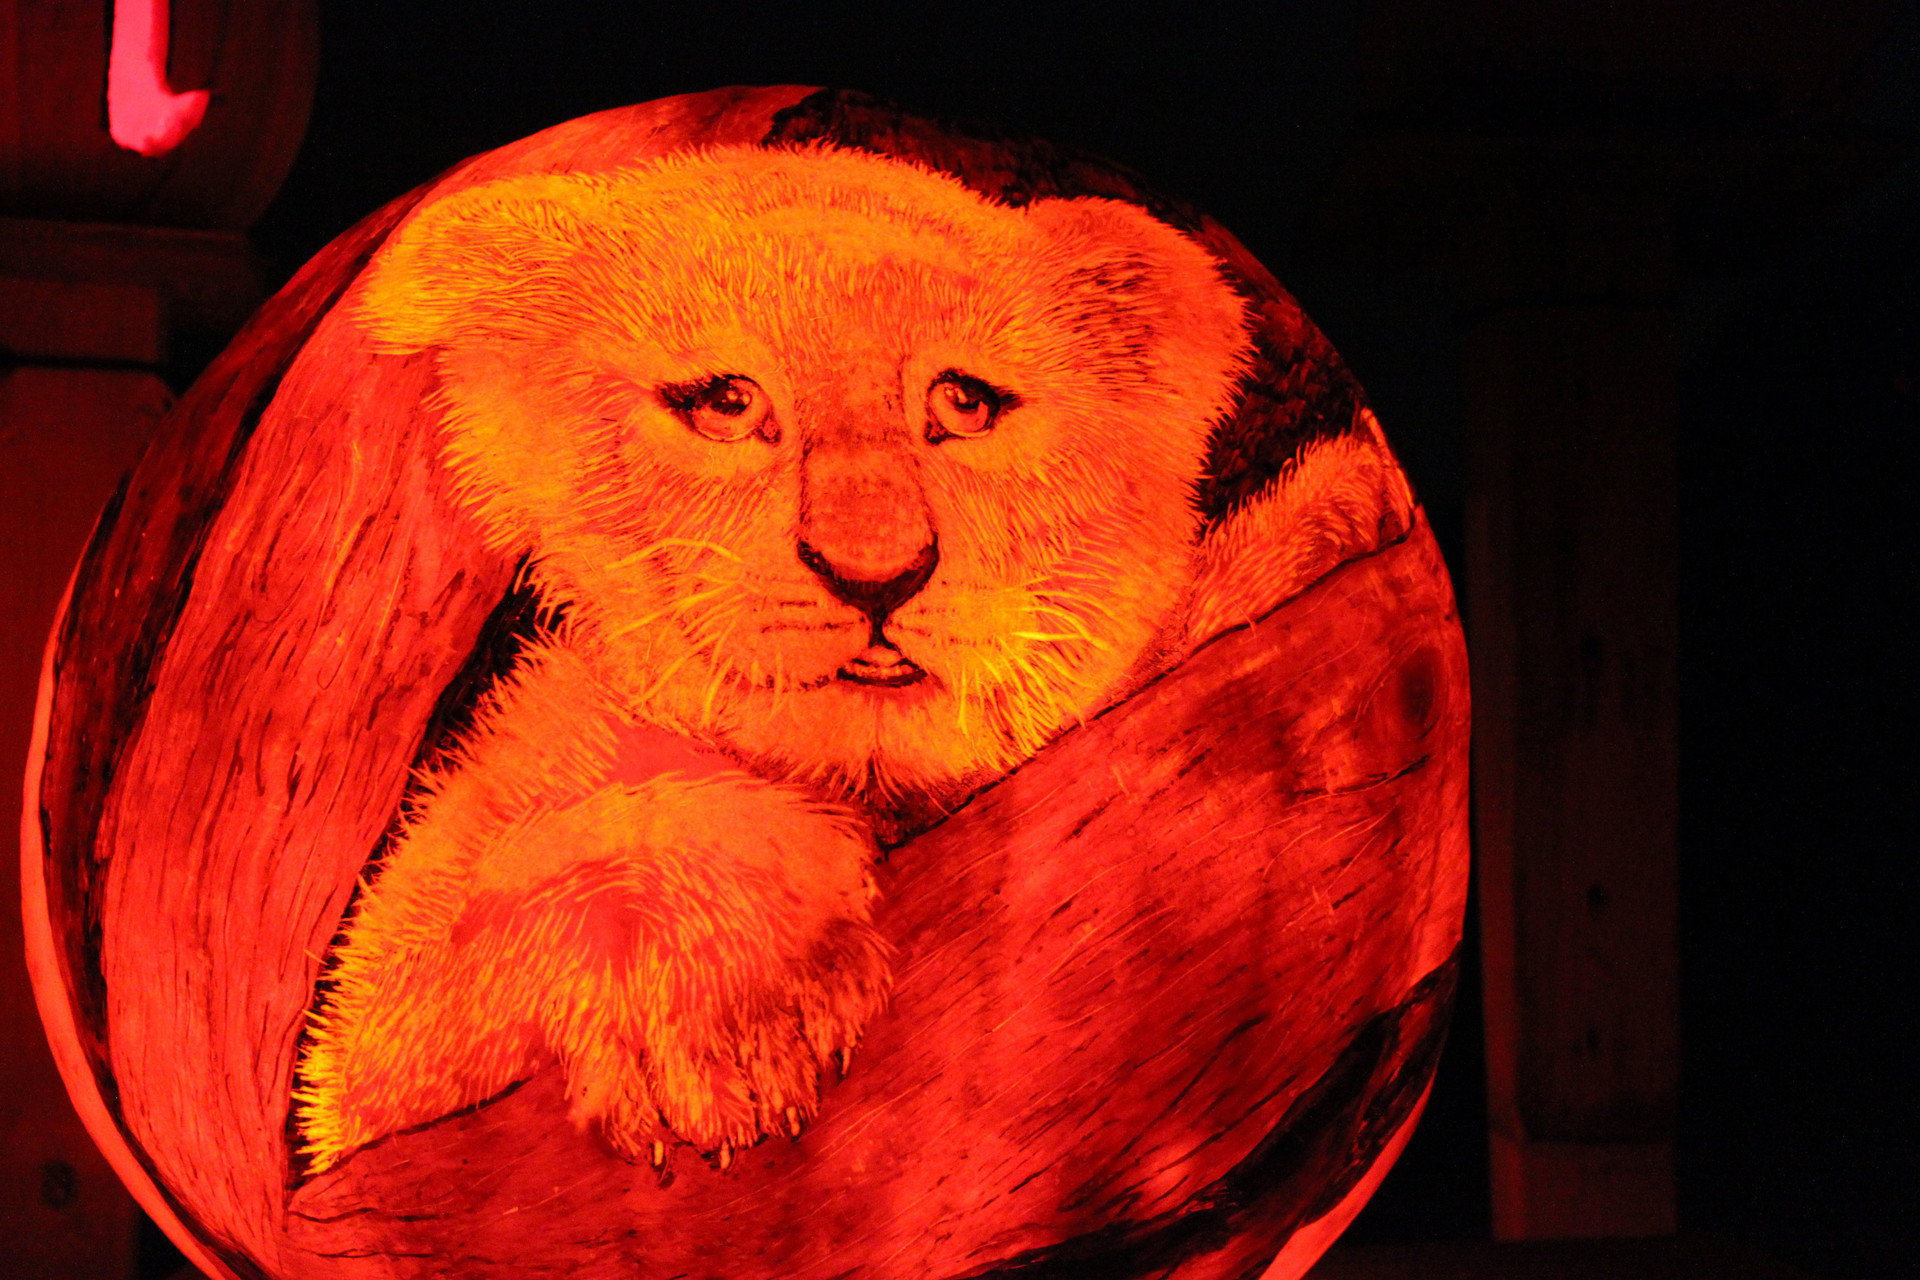 art artistic artsy Design festive glow halloween holiday lights night night lights orange pumpkins Trip Ideas color red indoor organ pumpkin macro photography human body